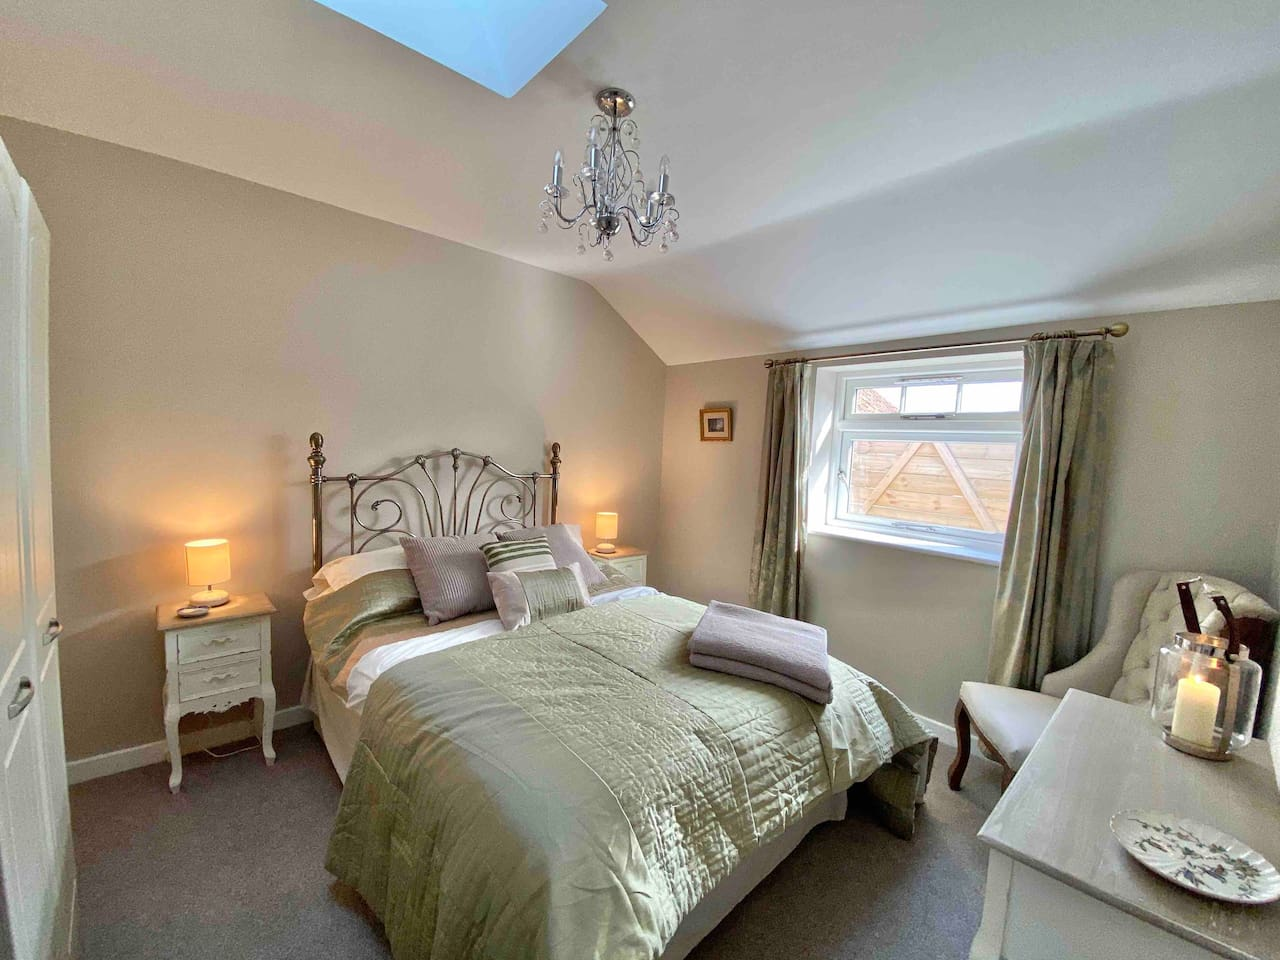 Romantic dreamy bedrooms